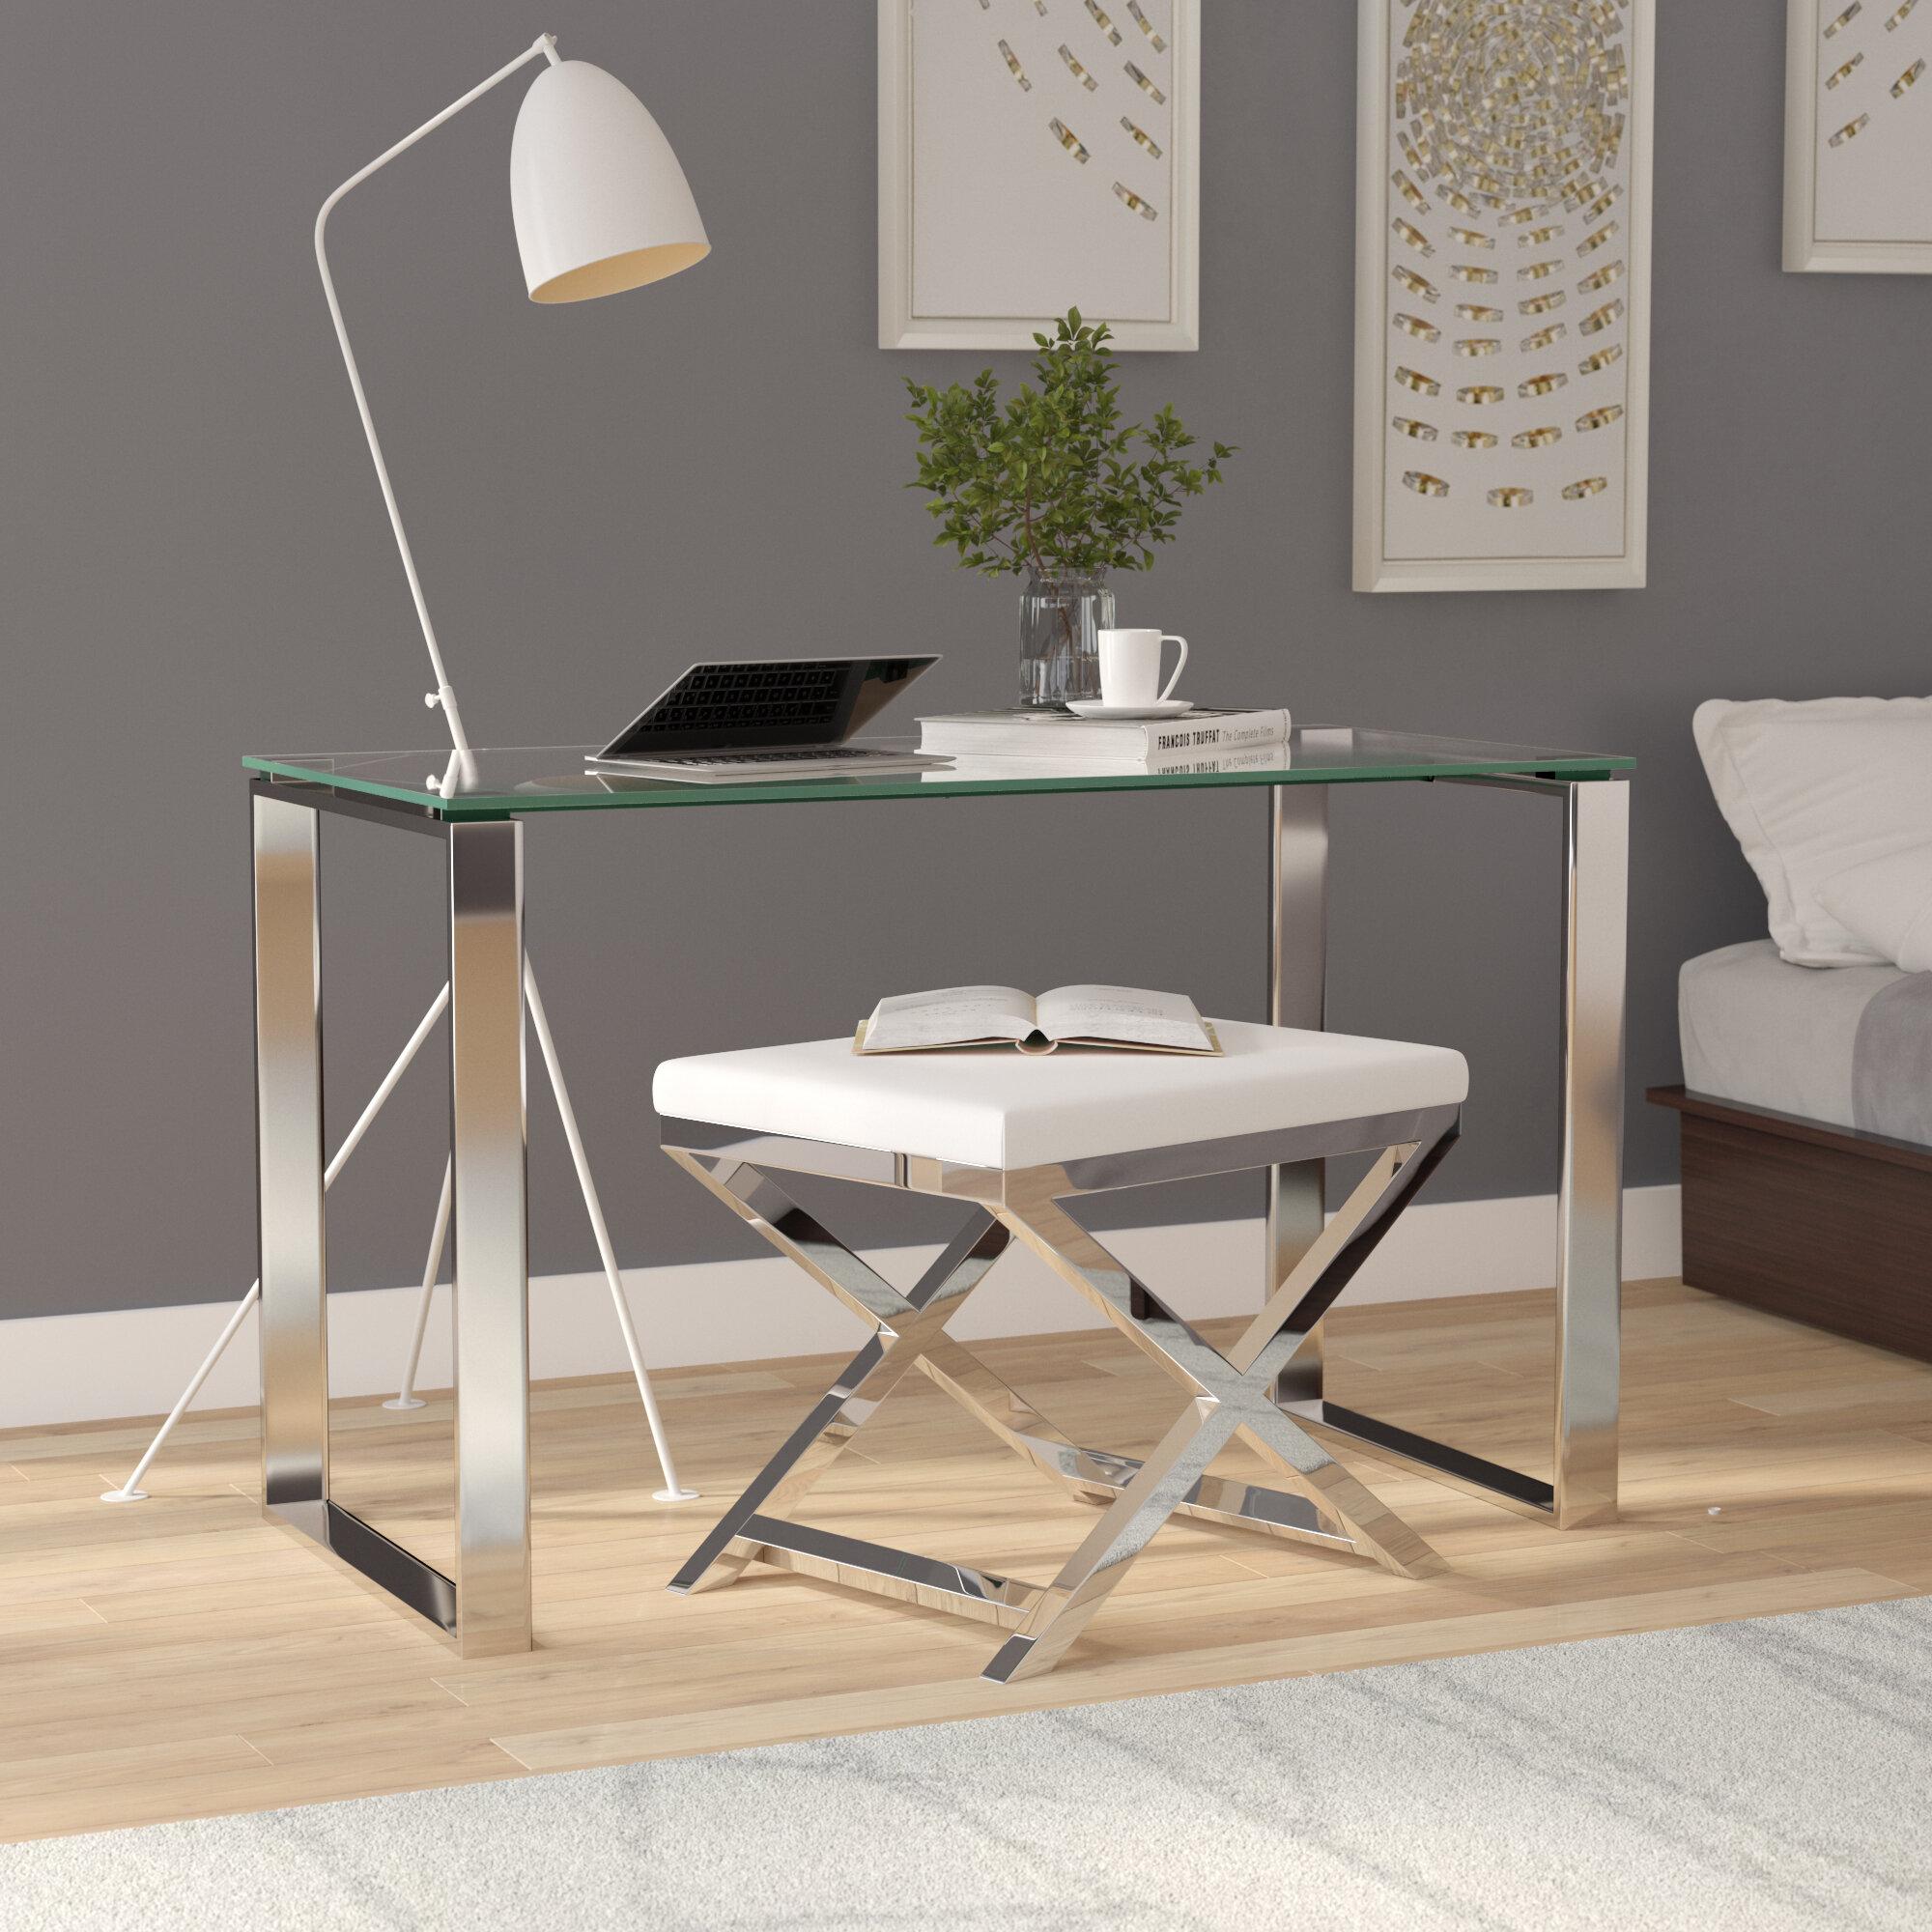 Stainless Steel Desks You Ll Love Wayfair Ca